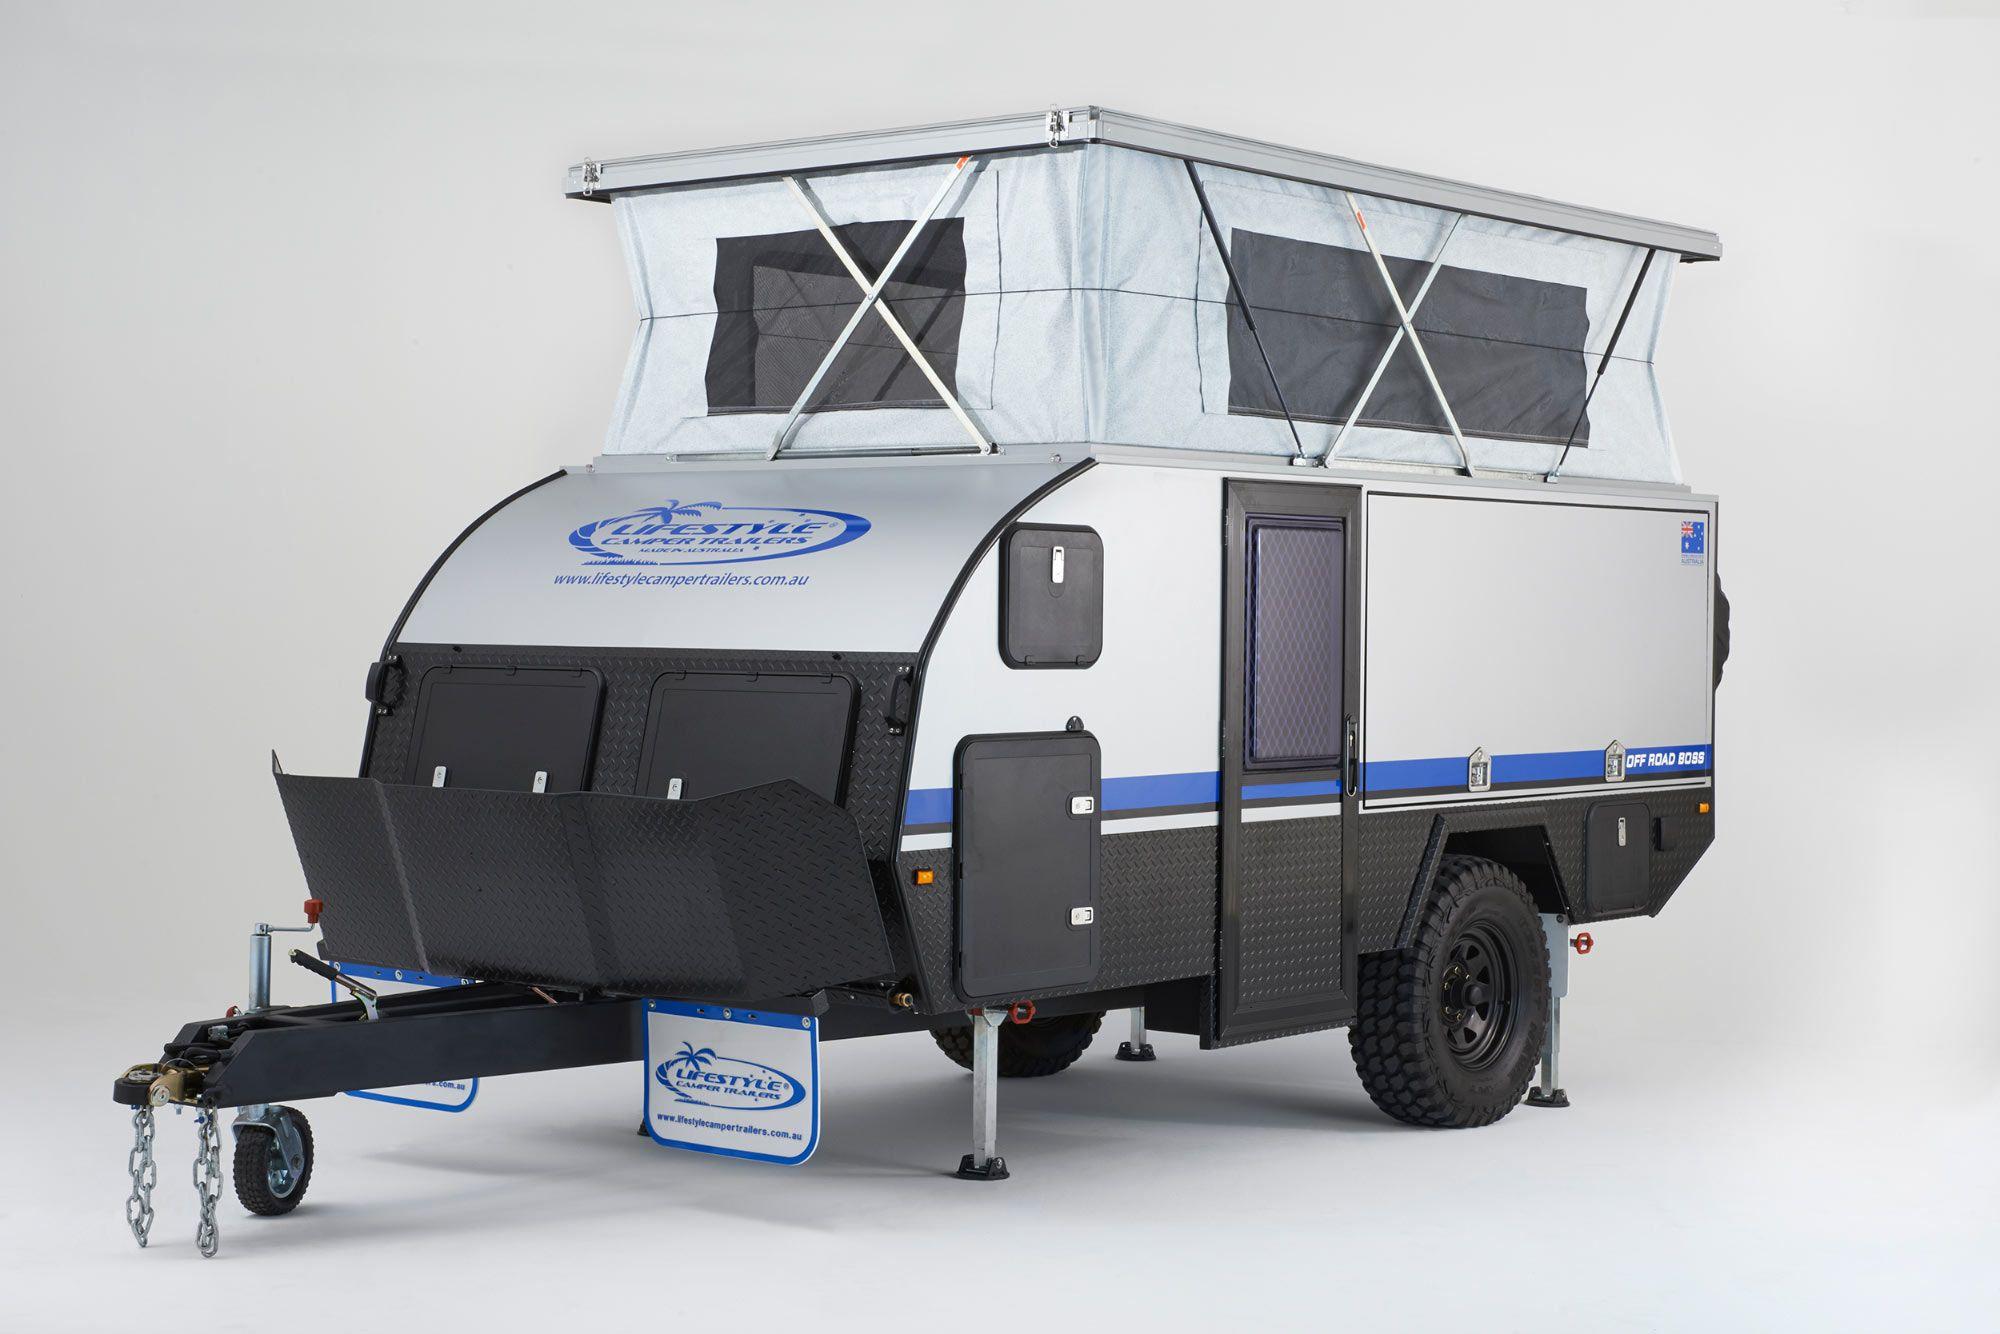 Lifestyle Reconn | Camper cars | Pinterest | Autocaravana y Caravana